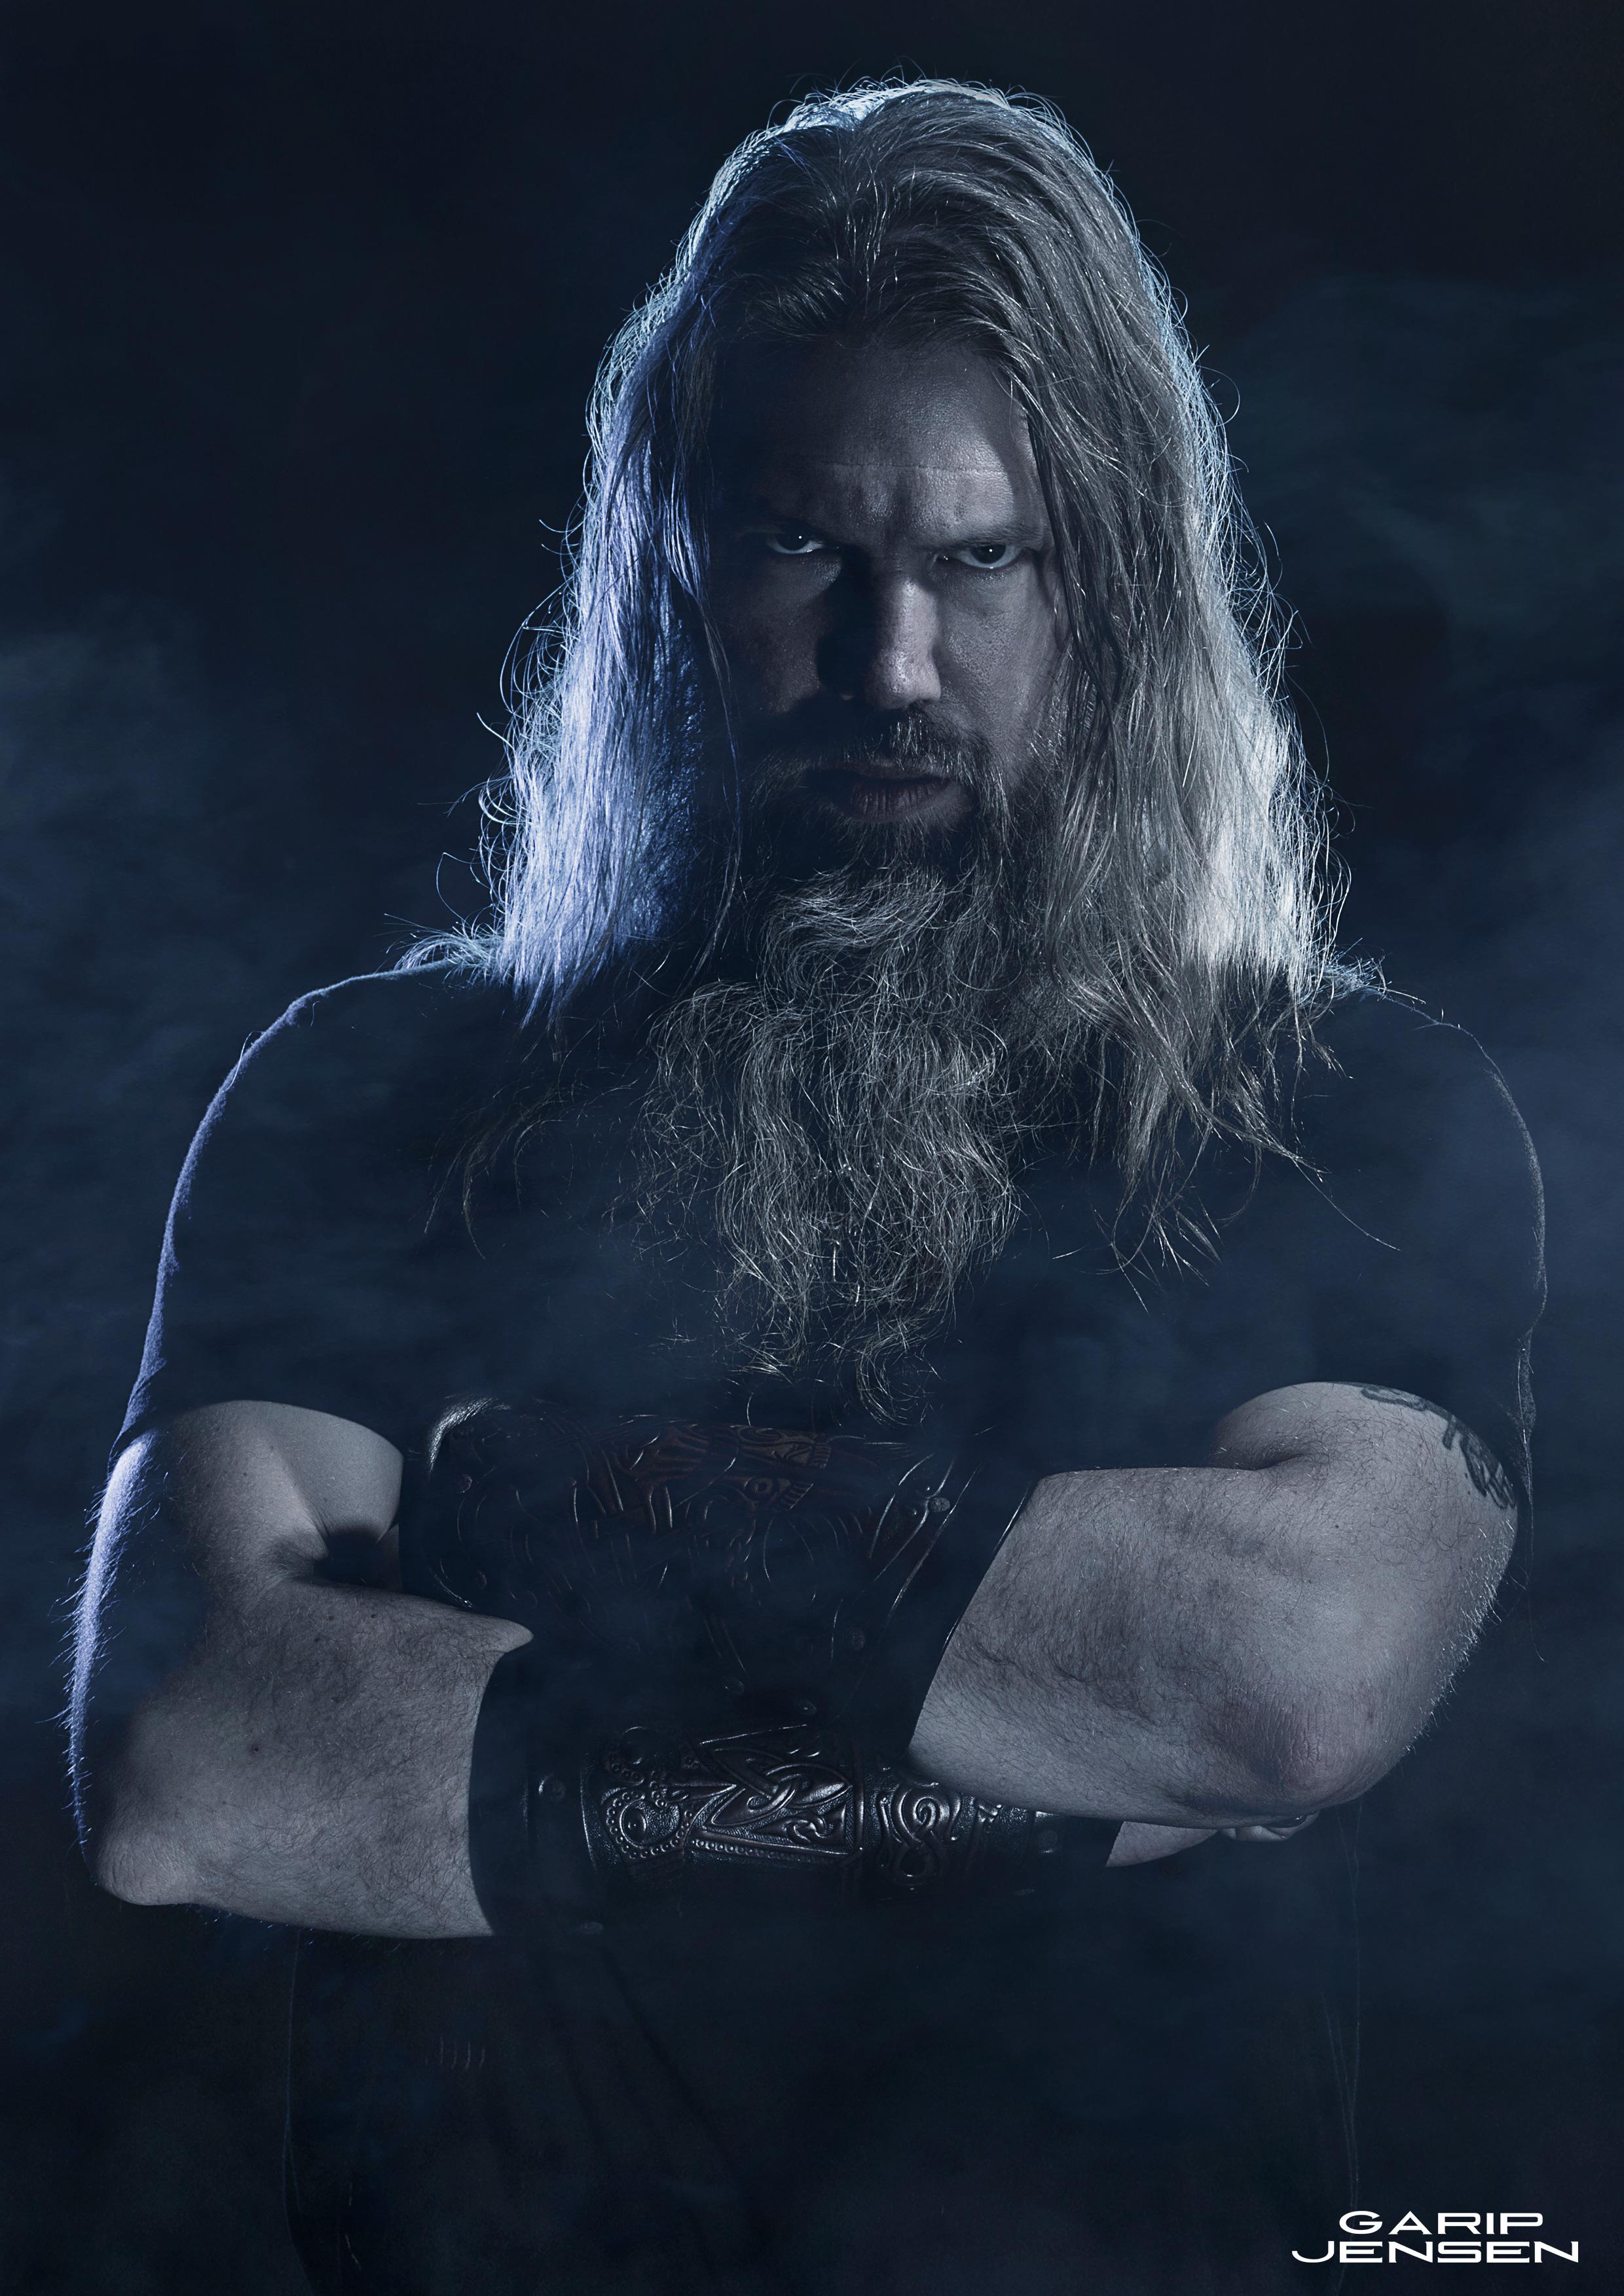 Studio photo of Johan Hegg from the Death Metal band Amon Amarth